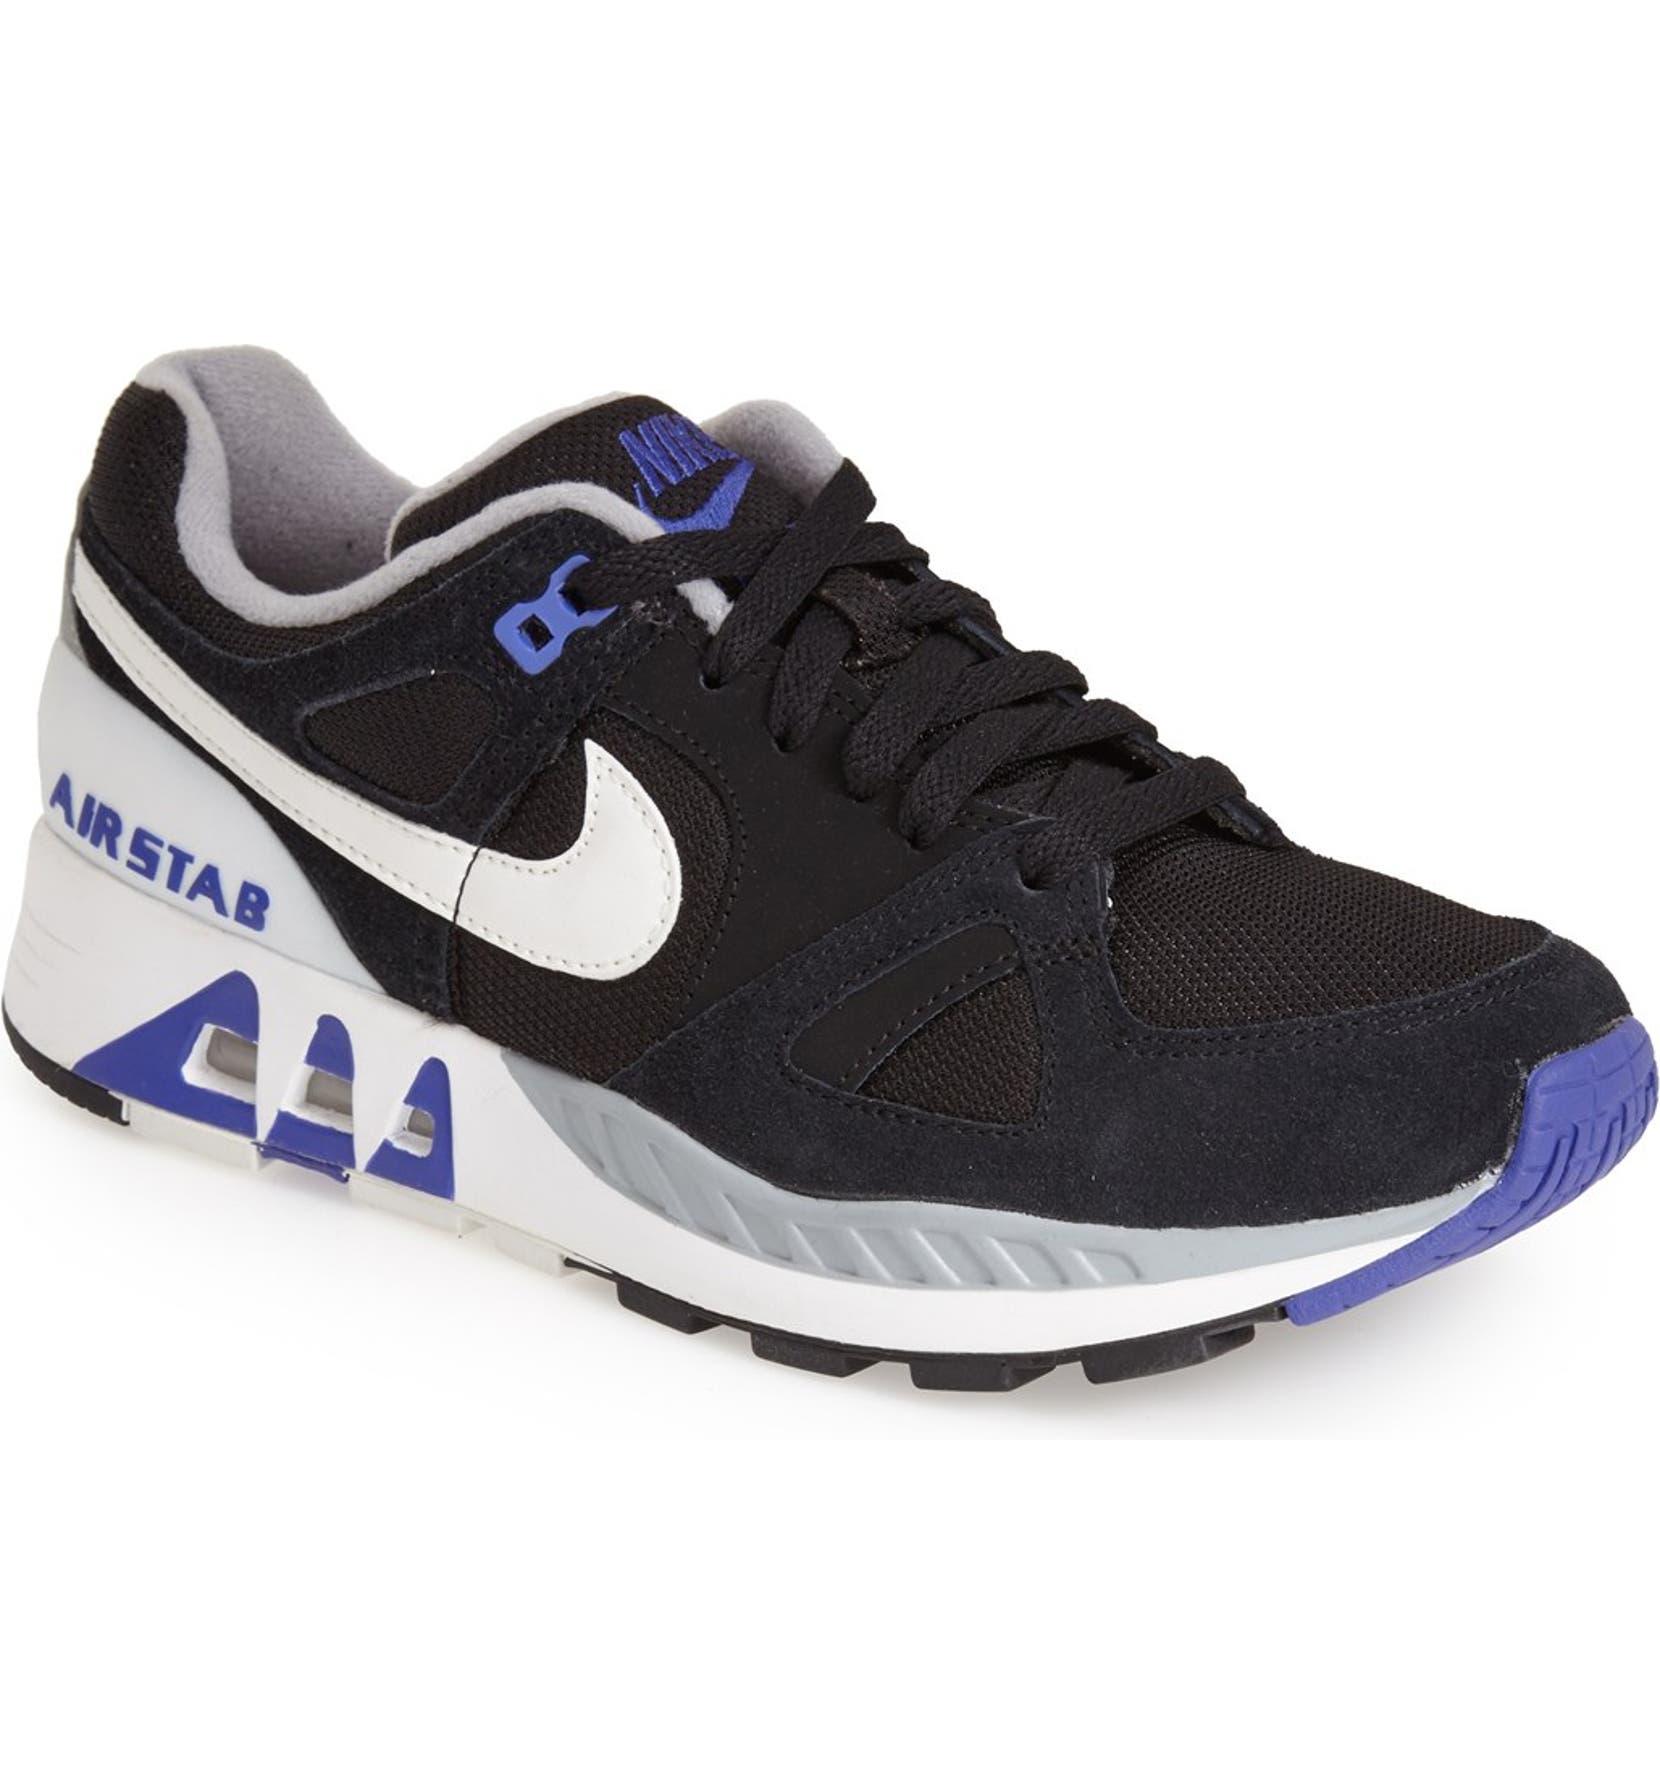 2a97dffbc7a4d Nike 'Air Stab' Sneaker (Men) | Nordstrom